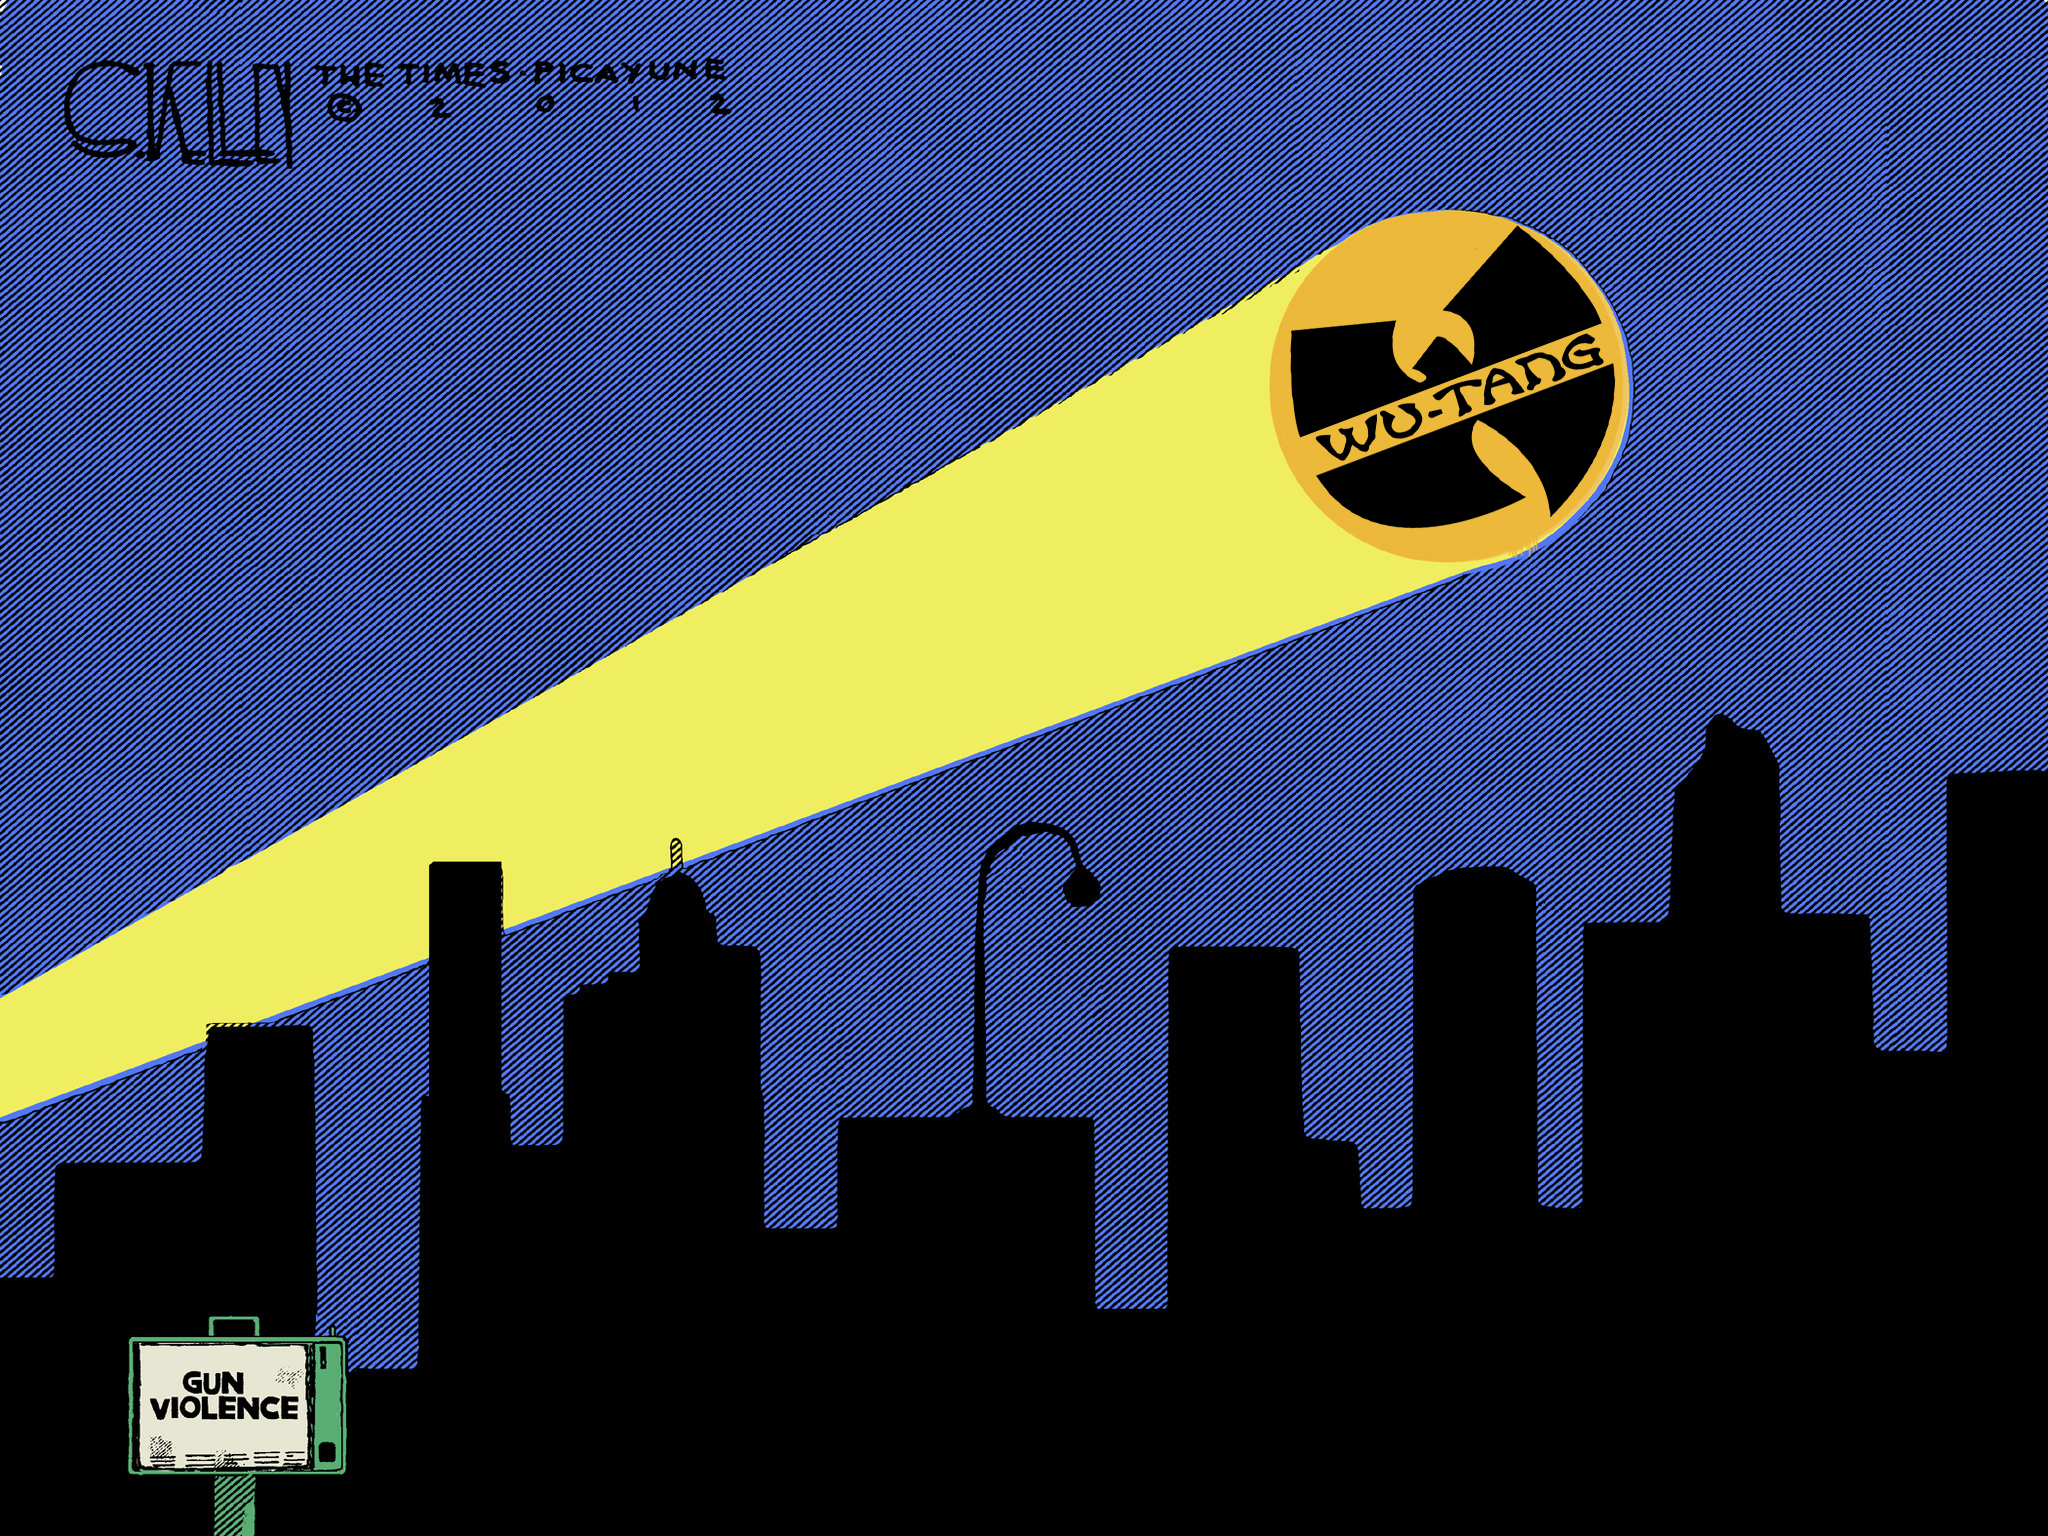 Wu-Tang Clan Signal (Bat-Signal) by Audico on DeviantArt